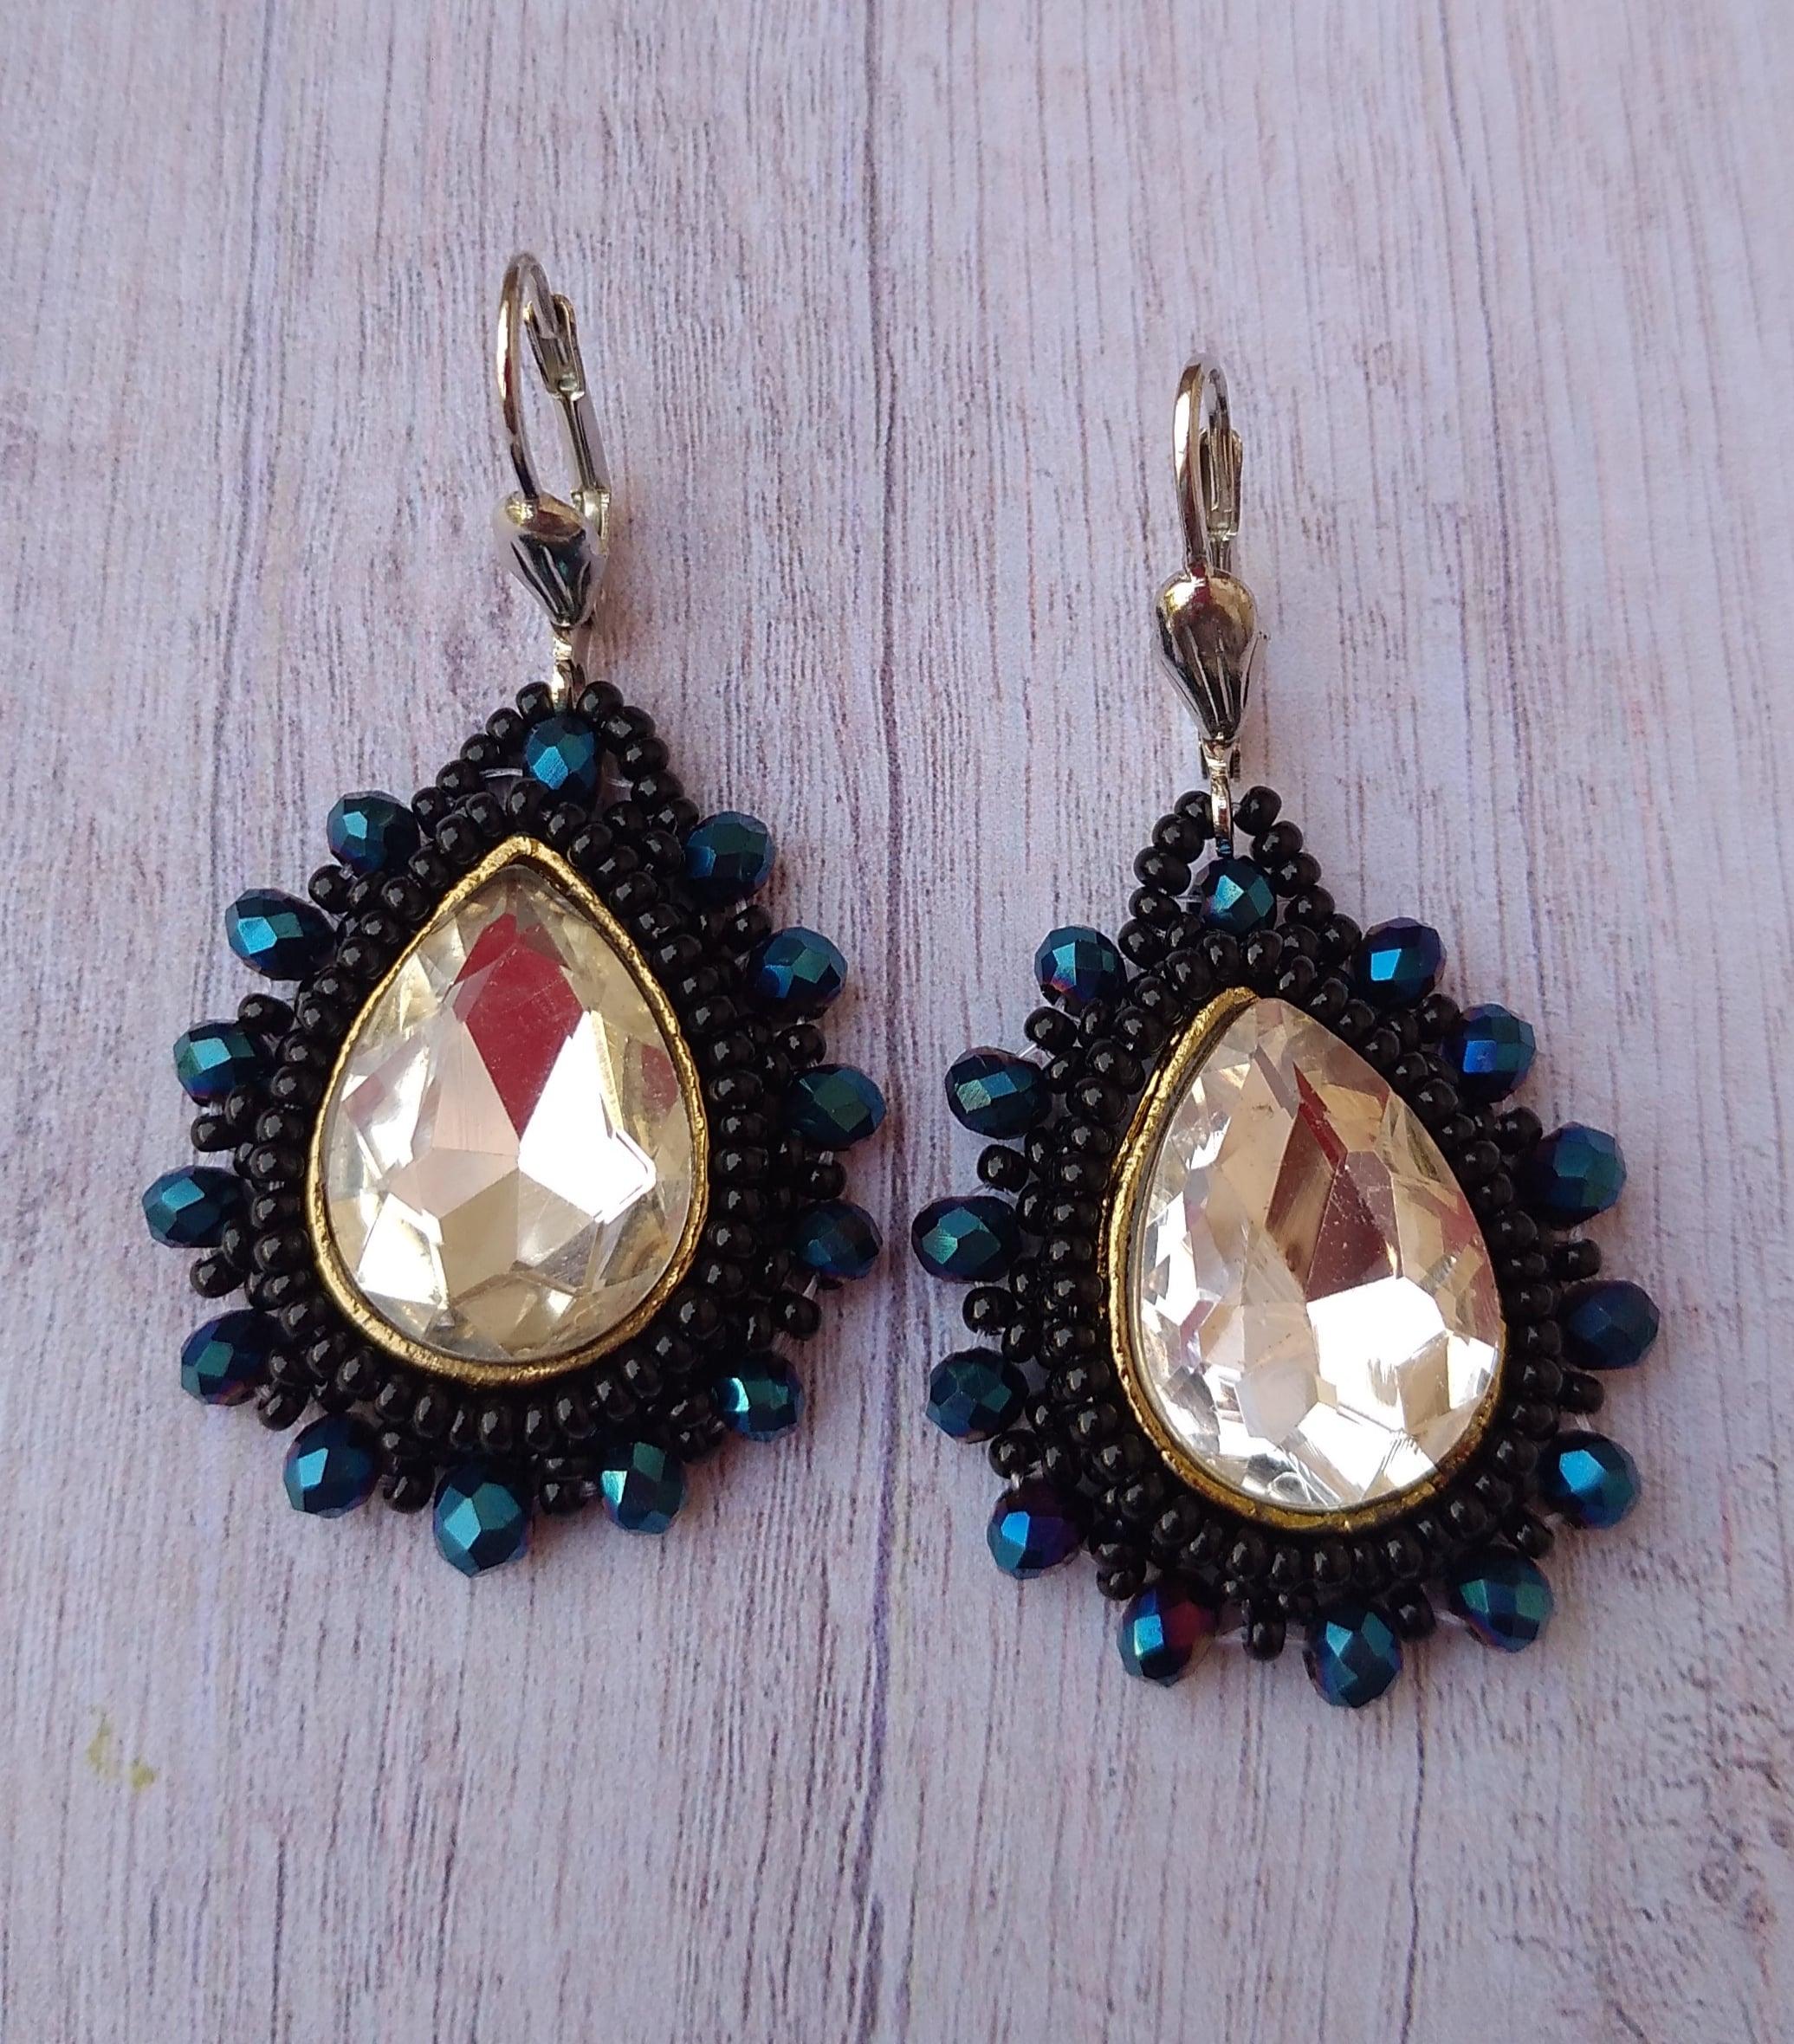 Women's Beaded Drop Earrings with Glittering Stone Work Slider Thumbnail 1/4